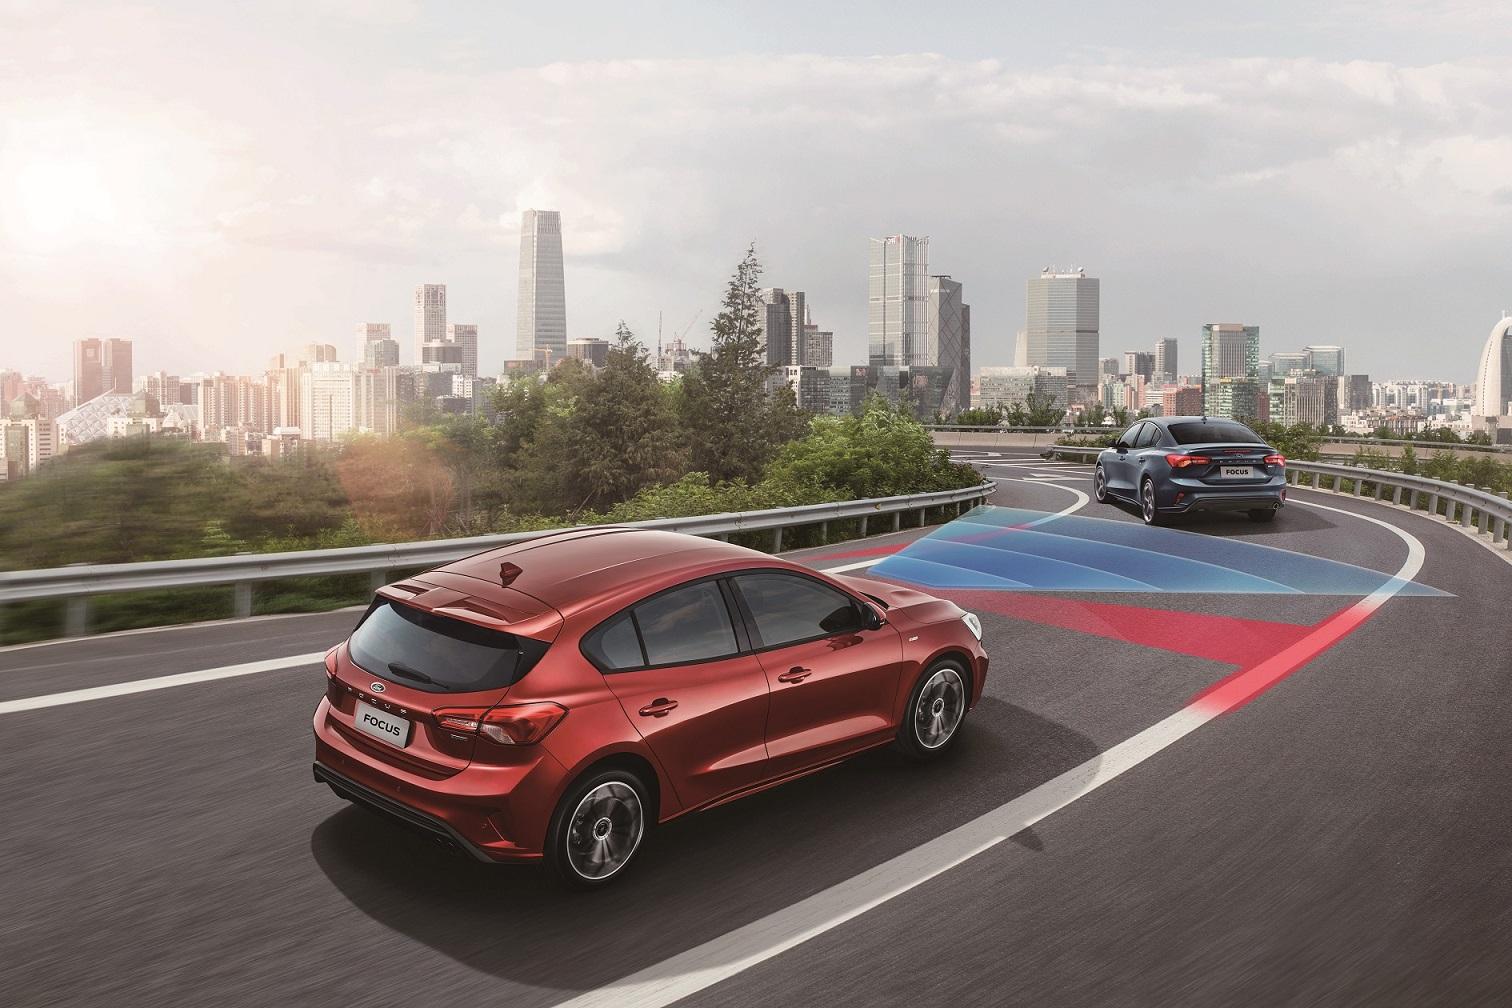 Ford Co-Pilot360 包含在 0-200kmh 內可作動的 ACC Stop & Go 全速域定速巡航調節系統(附低速跟車)與 LCA 車道導正輔助系統。